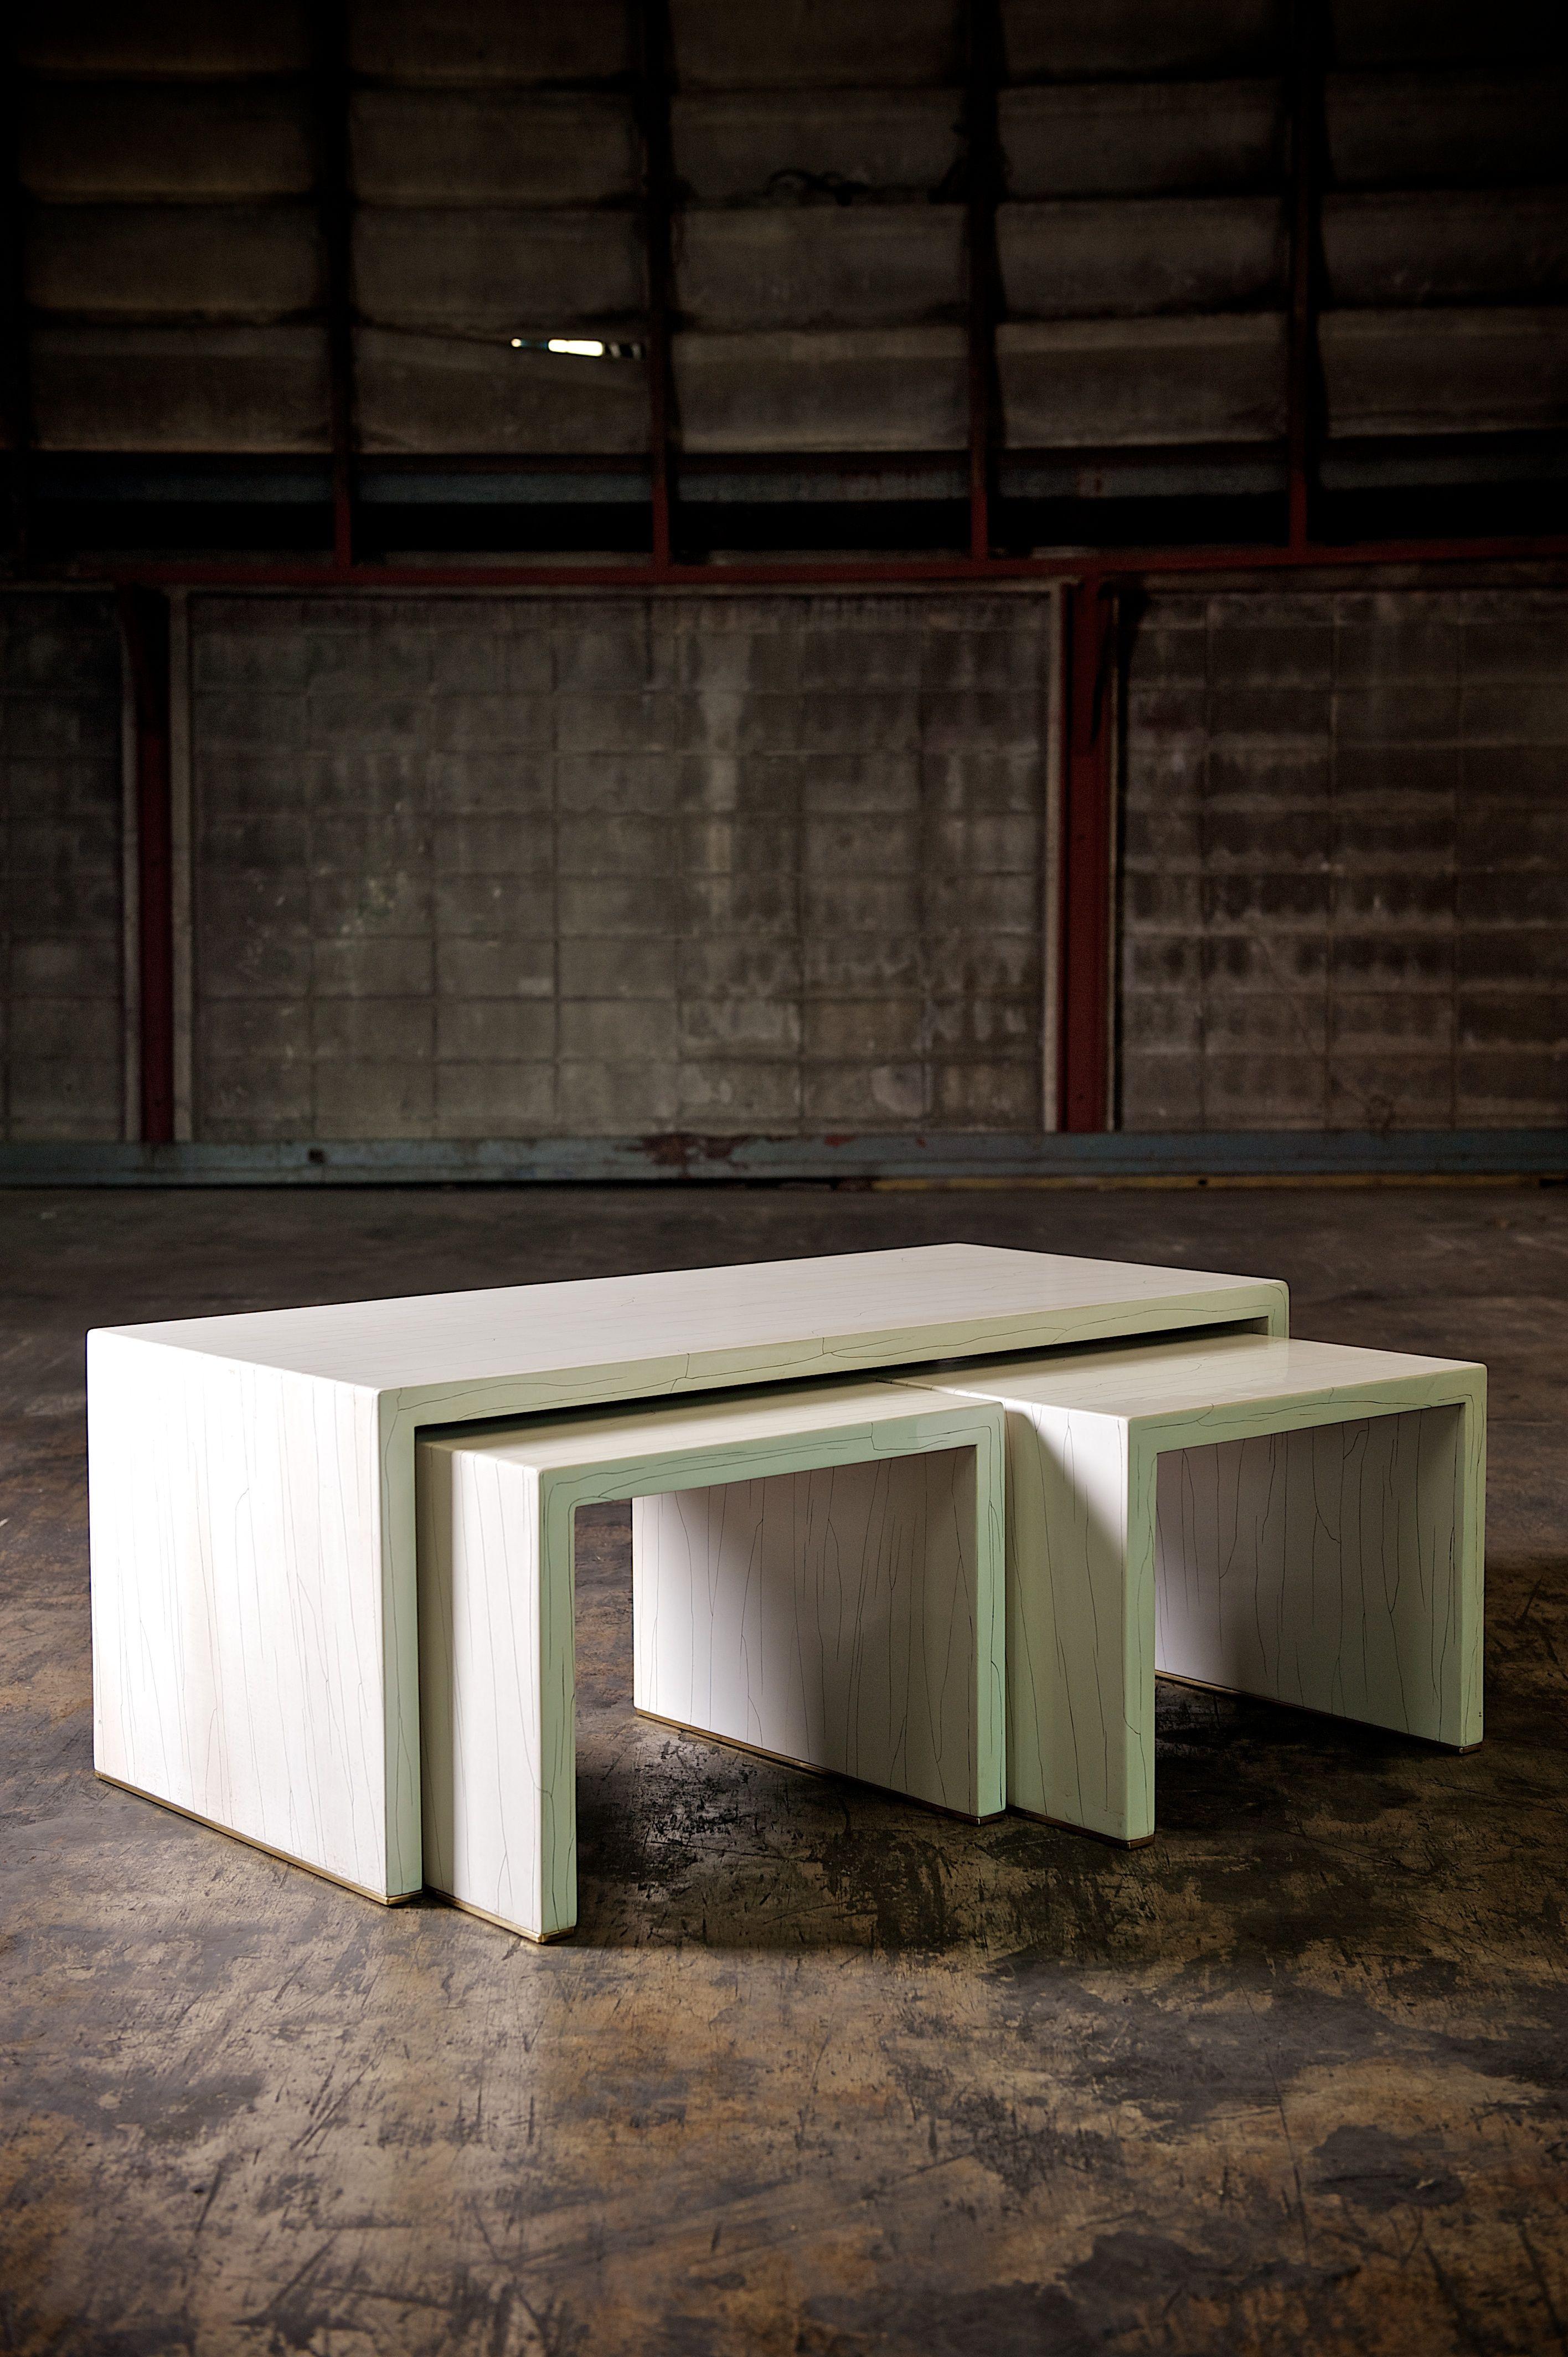 Modular Coffee Table T A B L E S │ Cocktail